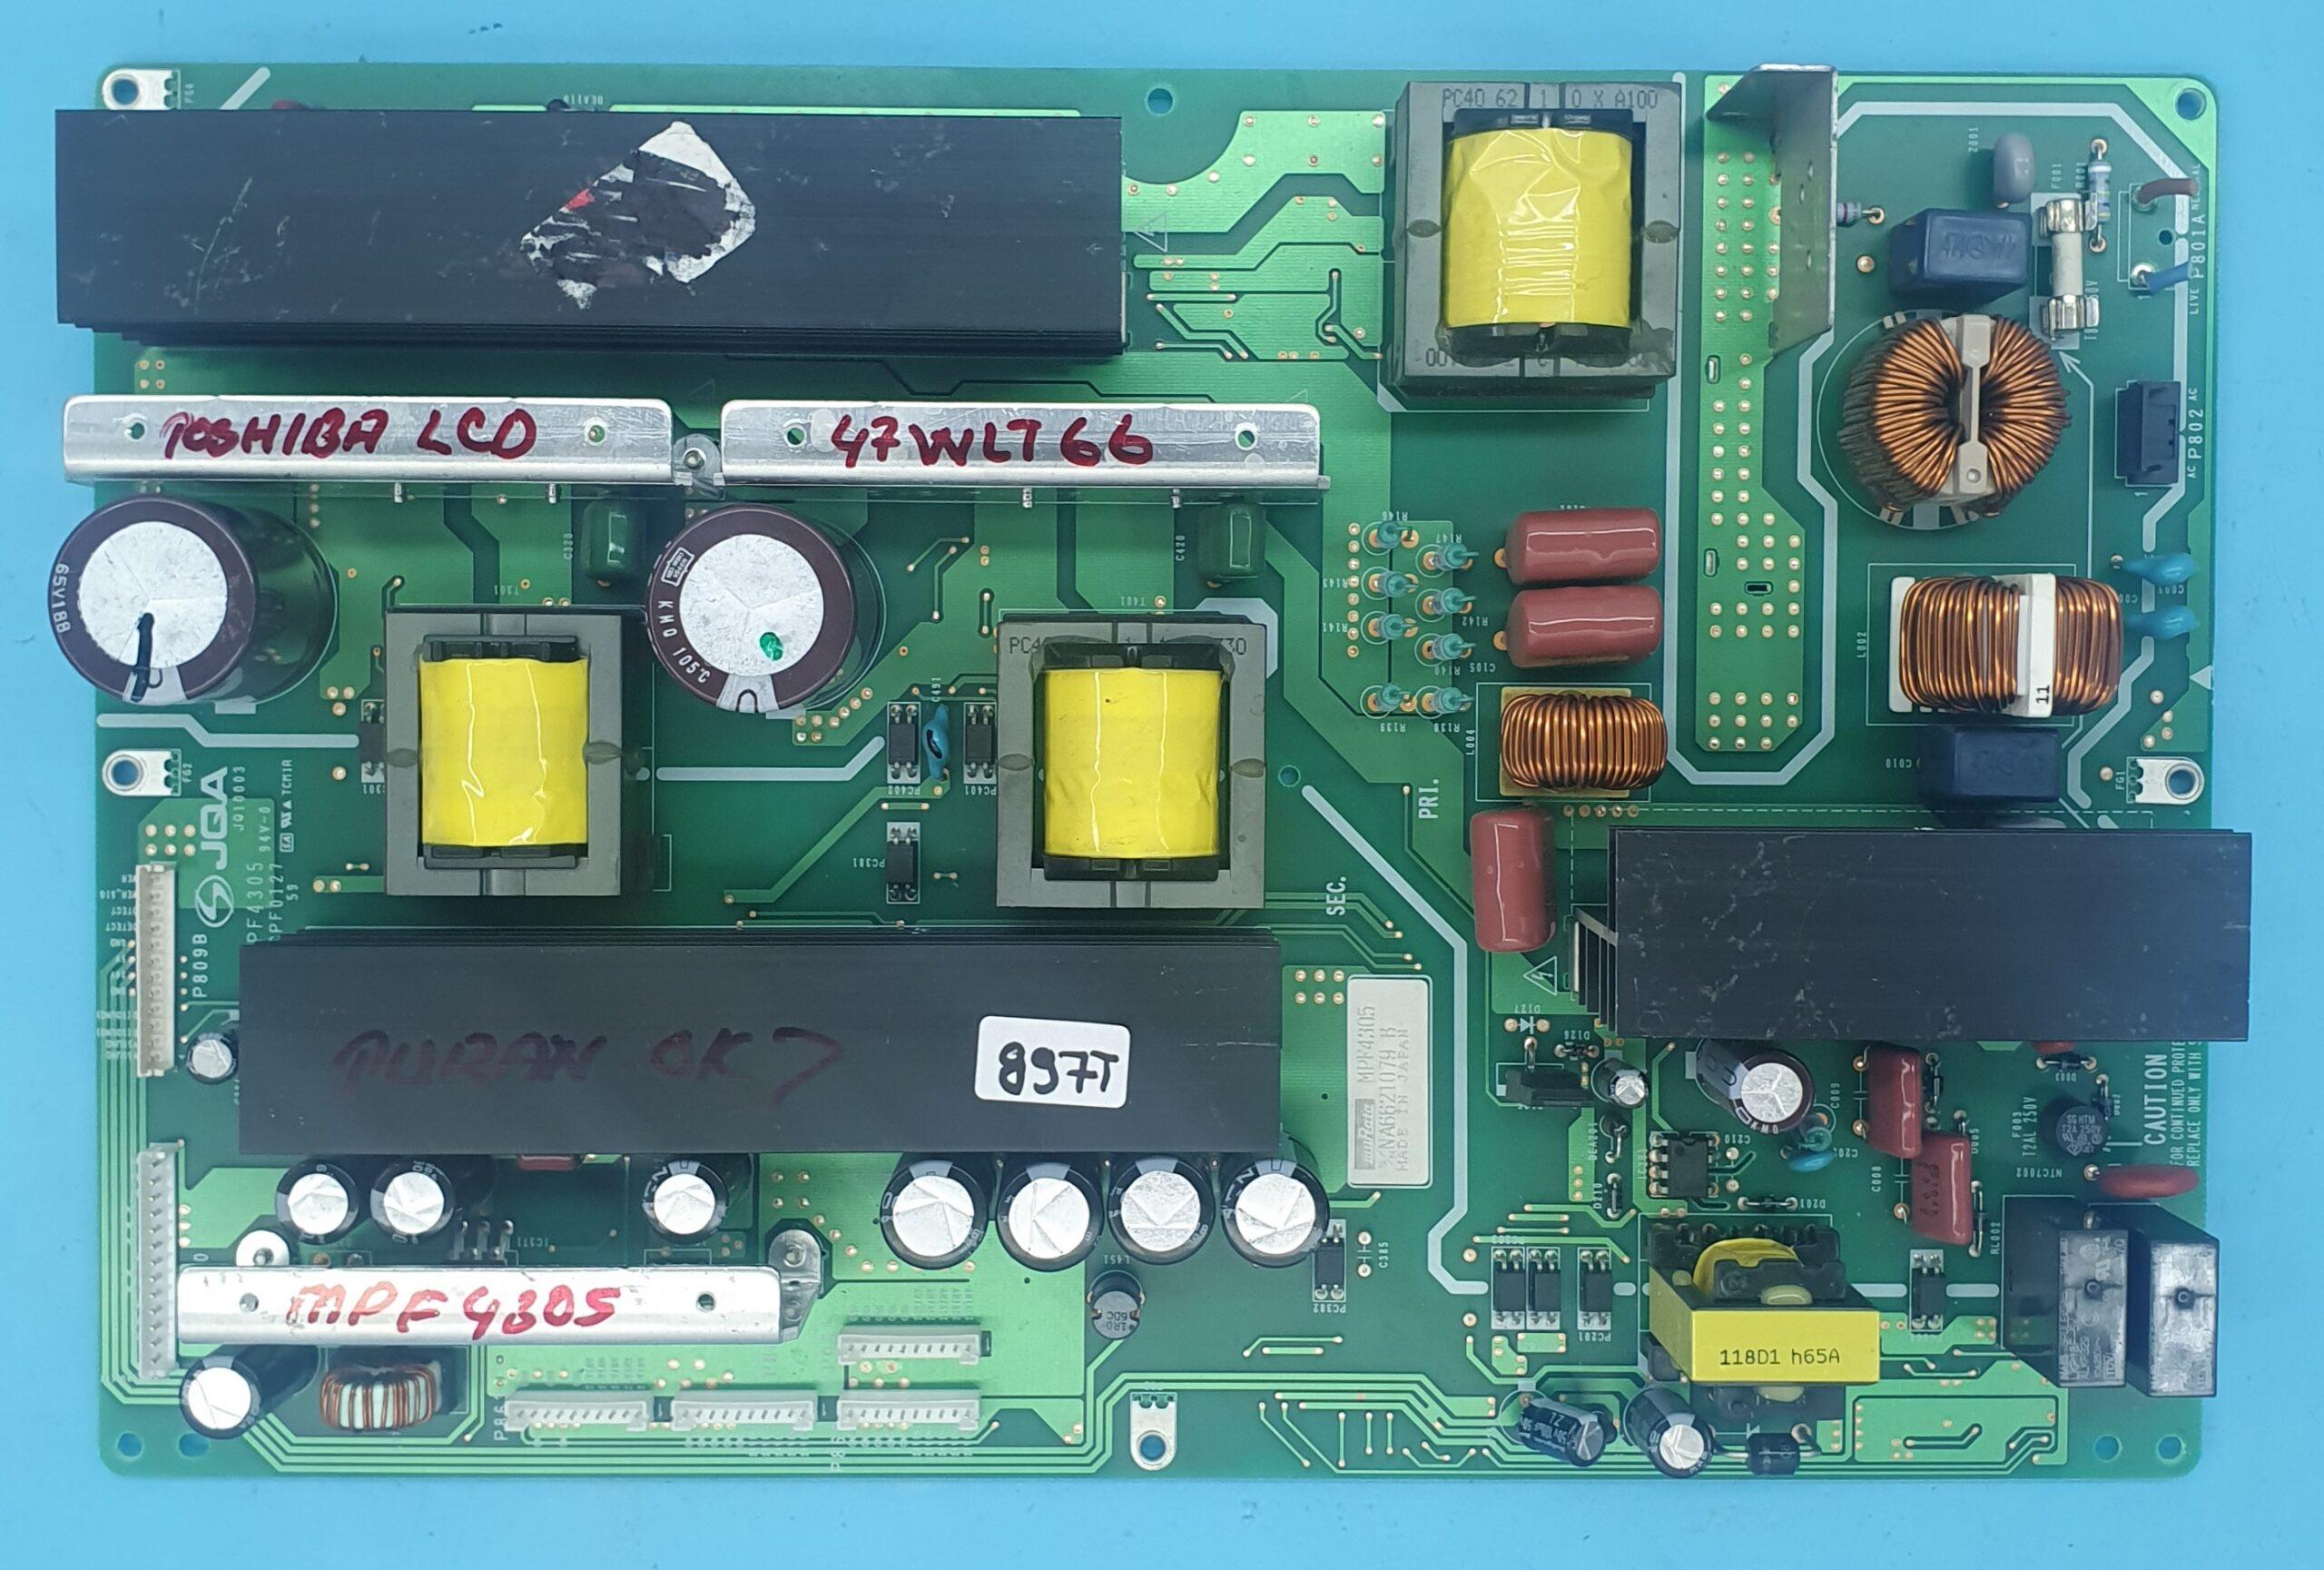 MPF4305 TOSHIBA Power Board (KDV DAHİL = 236 TL)